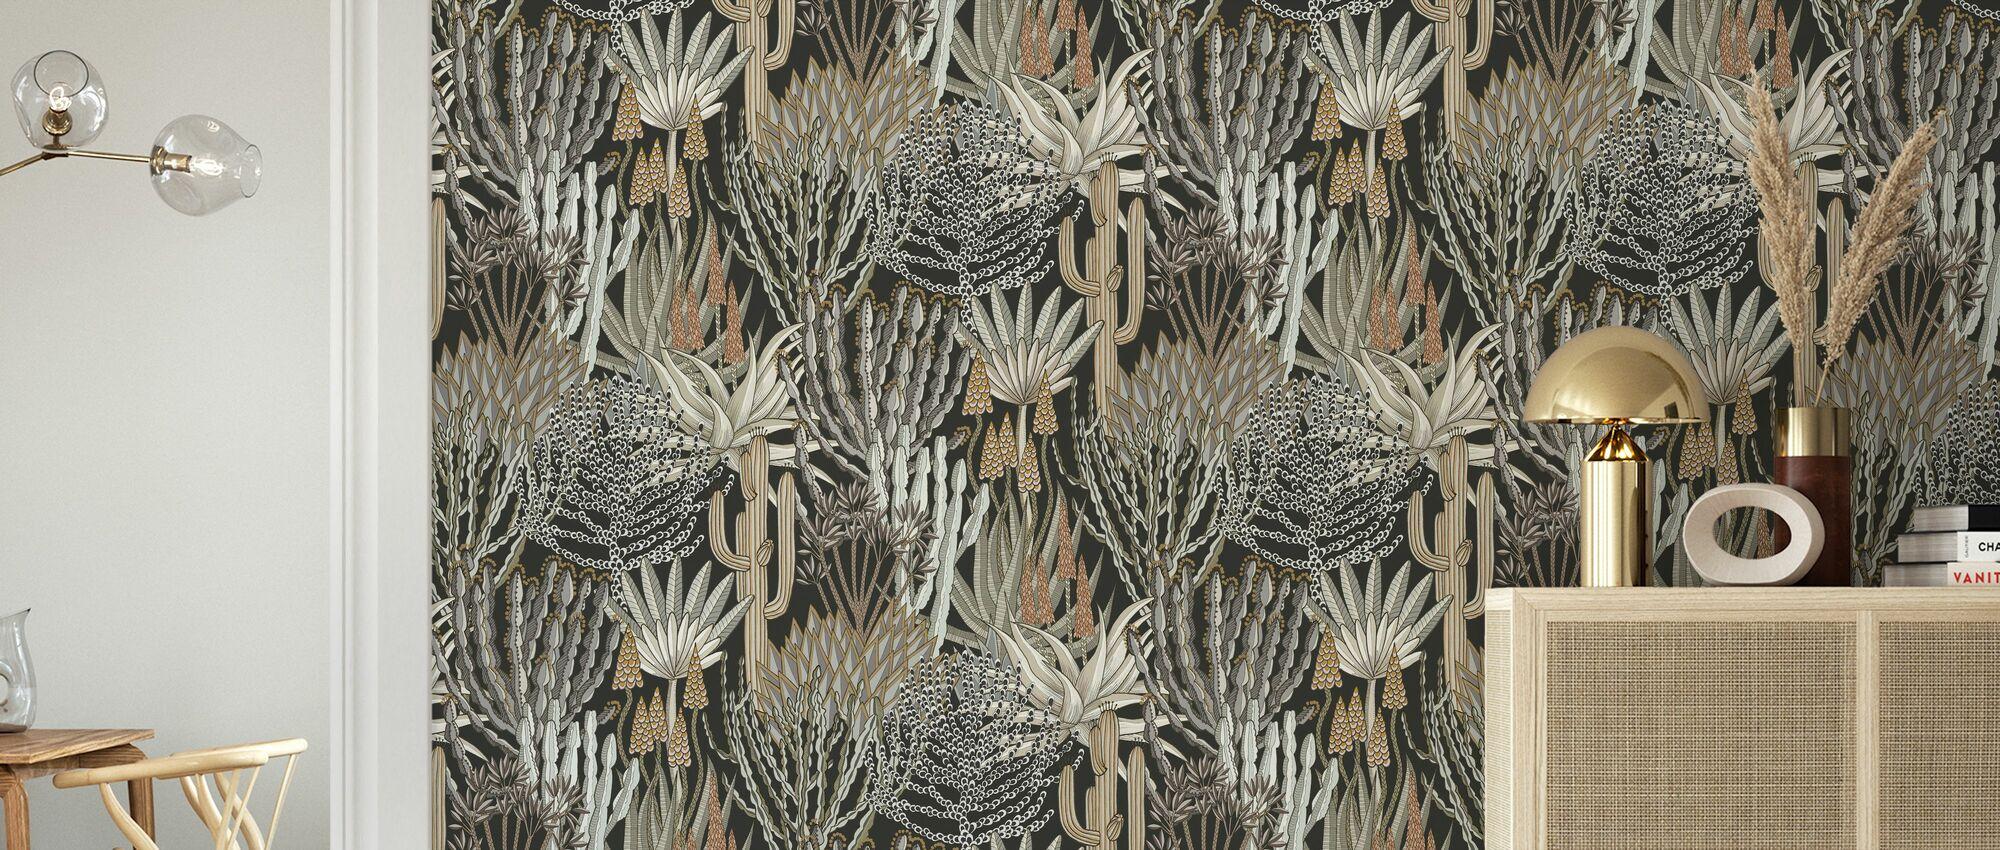 Euphorbia Forest - Africa - Wallpaper - Living Room